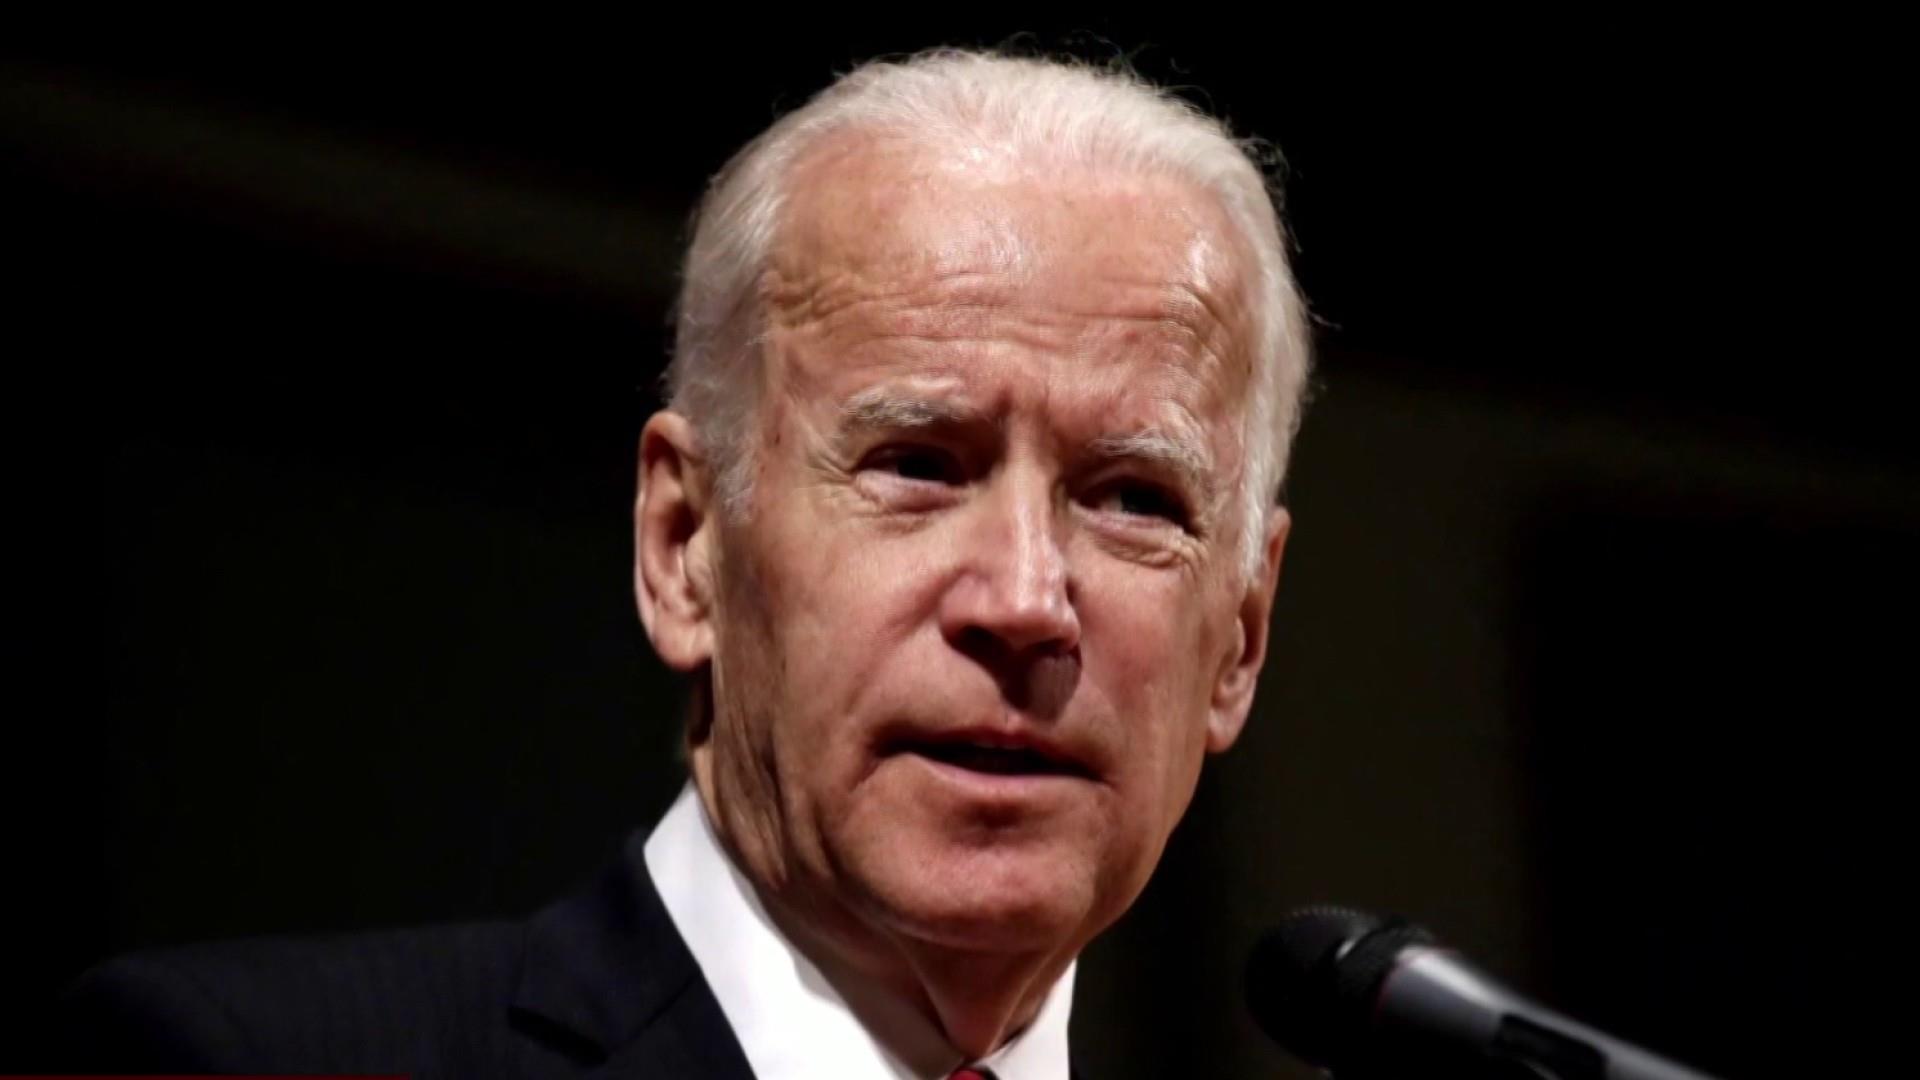 Biden's past abortion record holds surprises: report